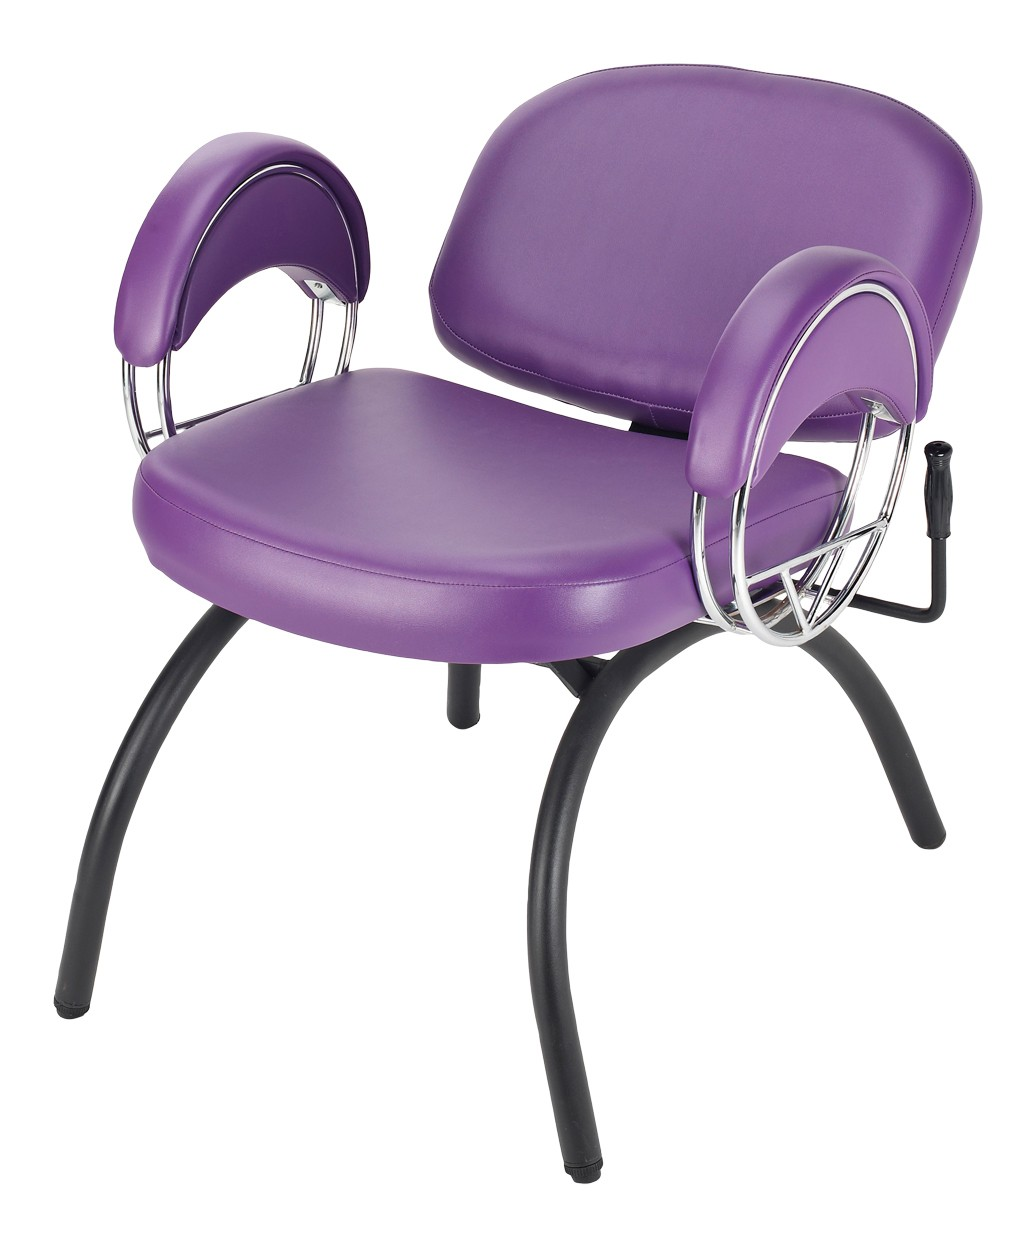 Pibbs 8930 JoJo Shampoo Chair